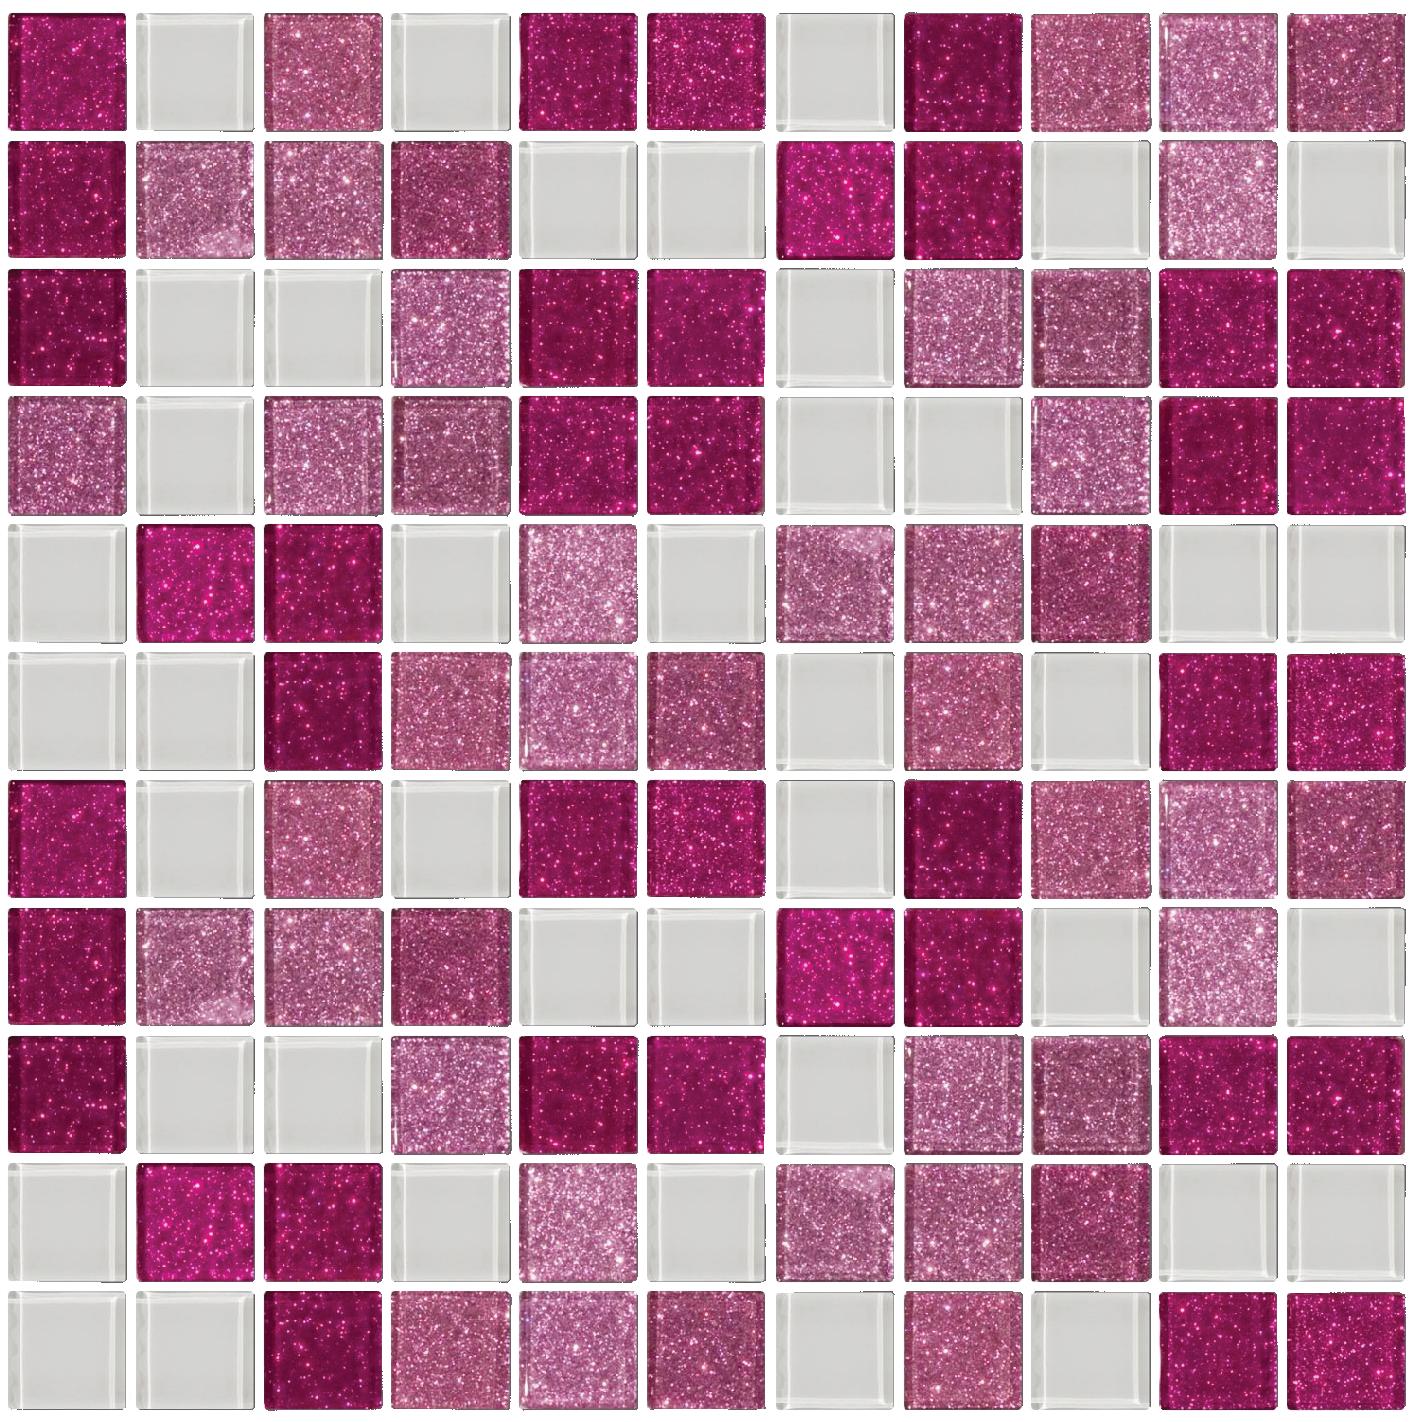 pink-glass-glitter-tile-susan-jablon-mosaics